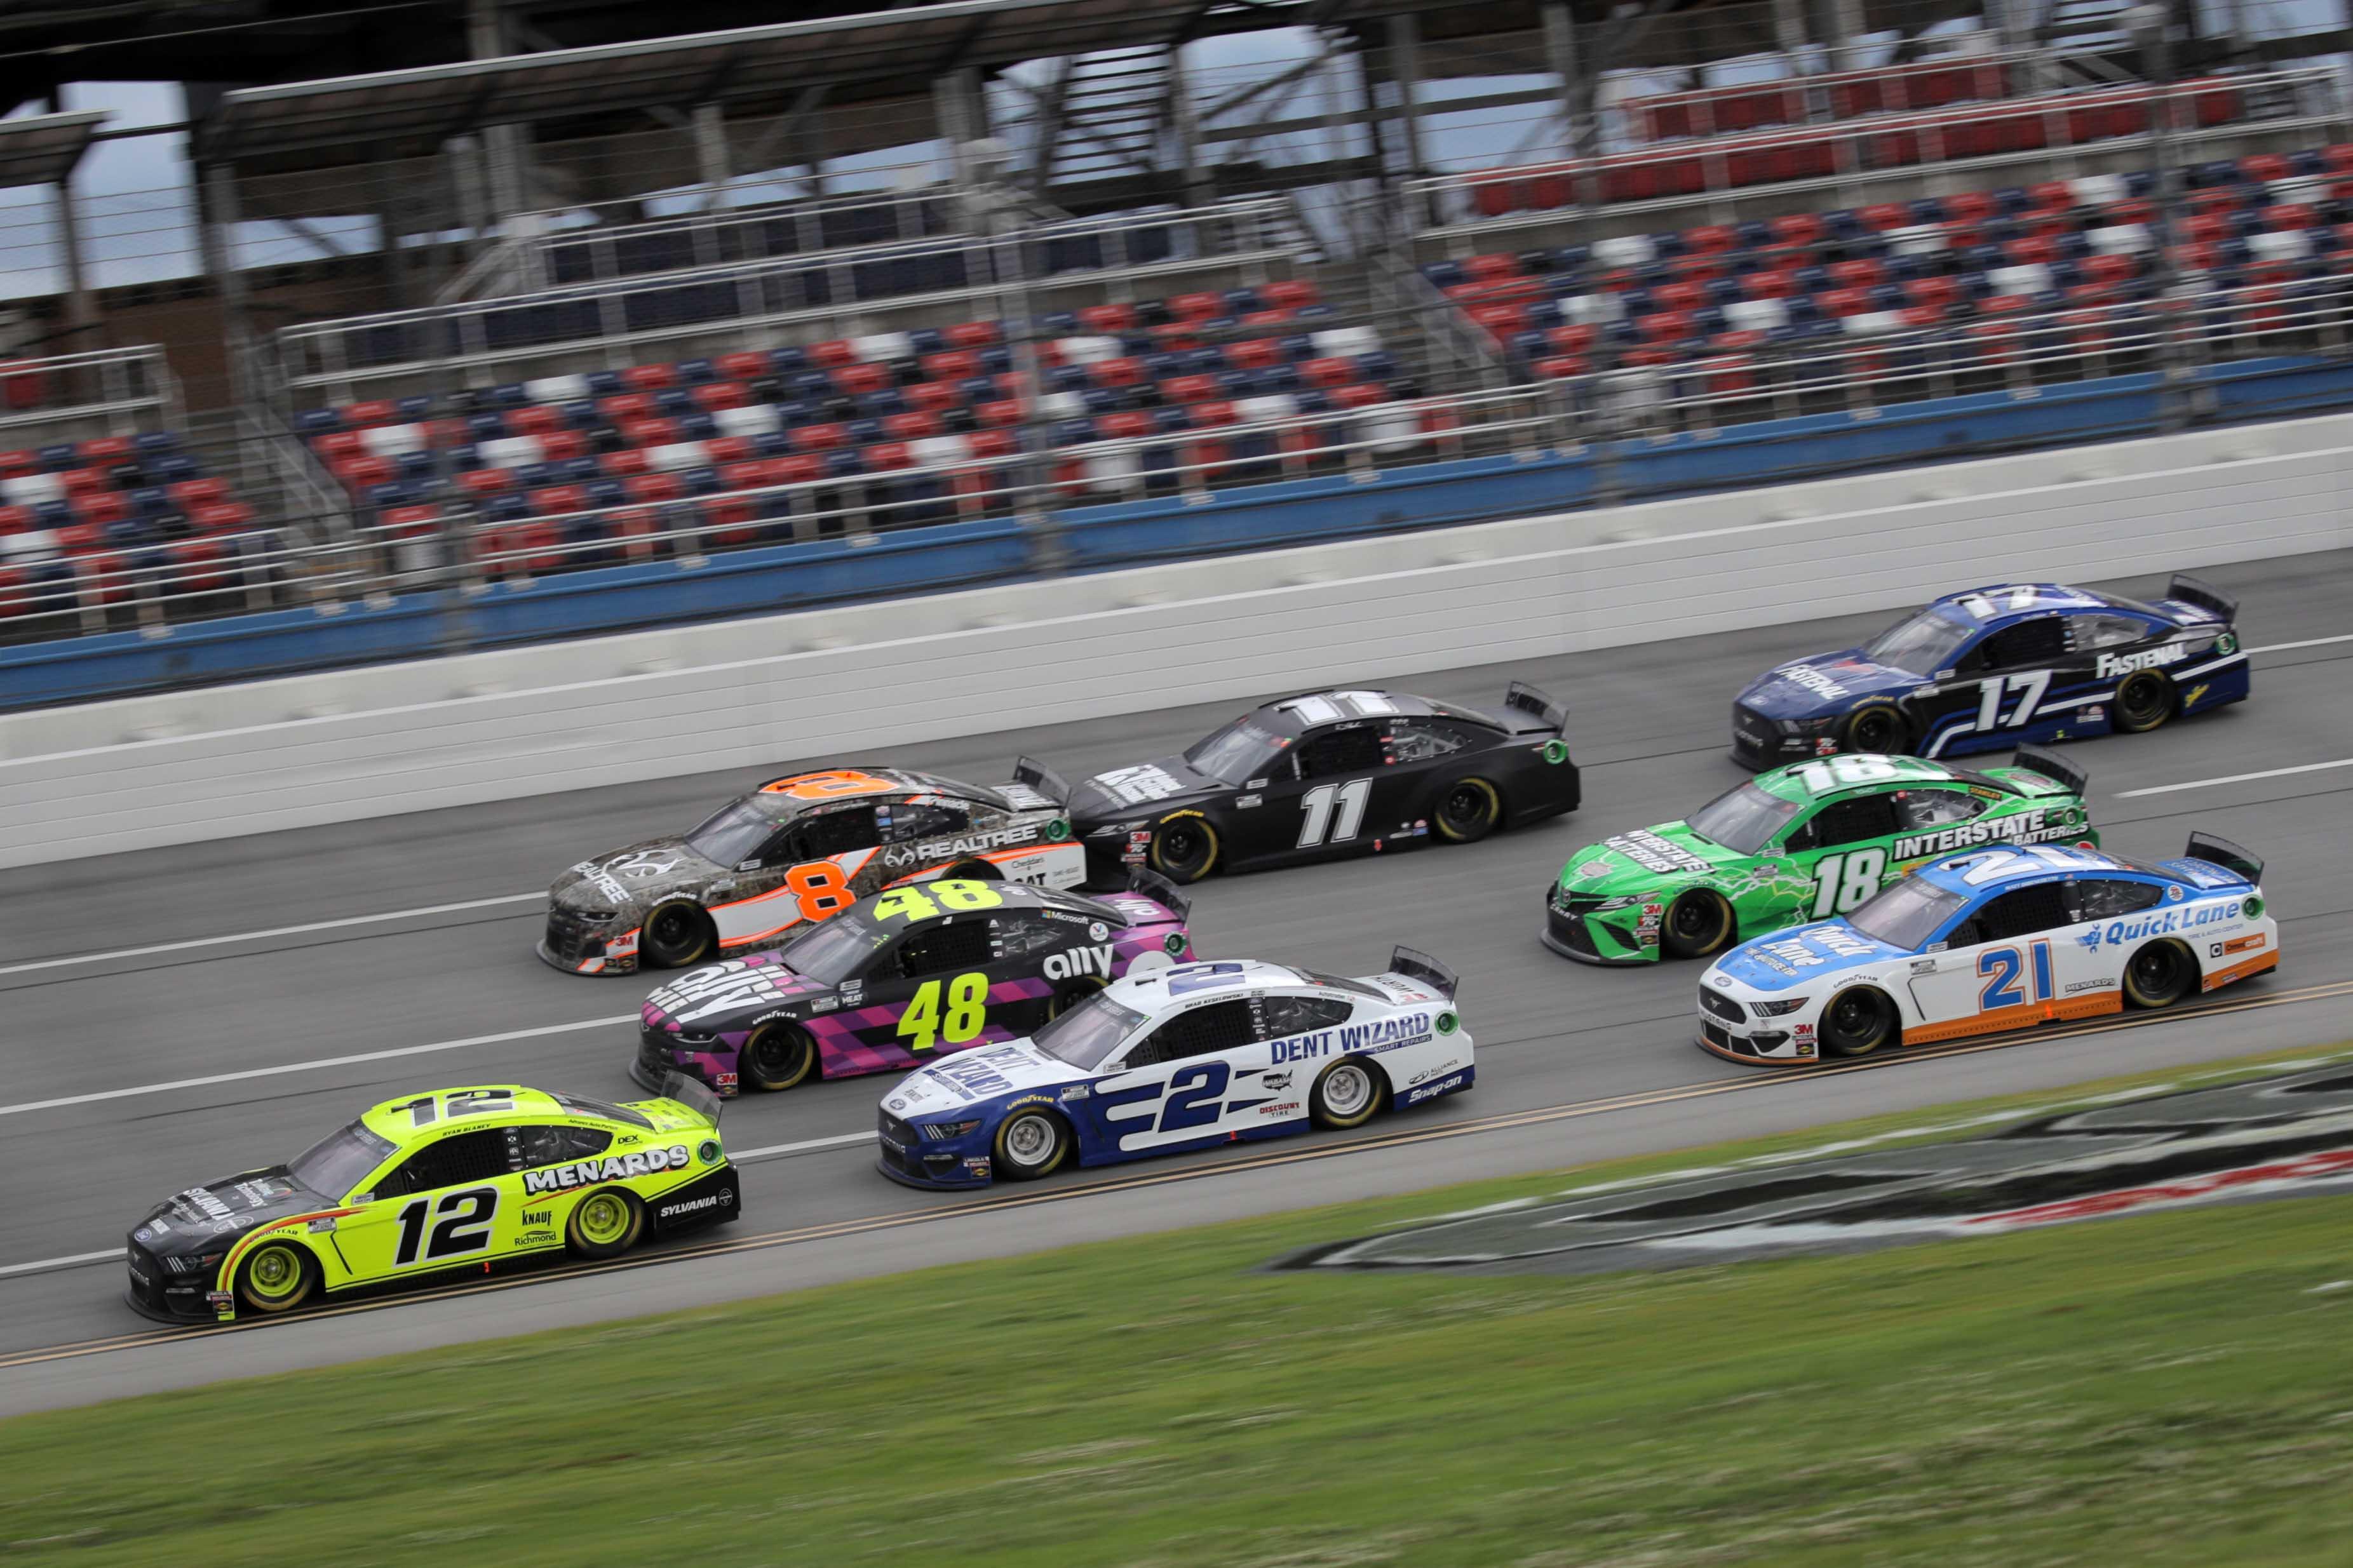 Ryan Blaney, Brad Keselowski, Jimmie Johnson, Matt DiBenedetto, Kyle Busch, Tyler Reddick and Denny Hamlin at Talladega Superspeedway - NASCAR Cup Series